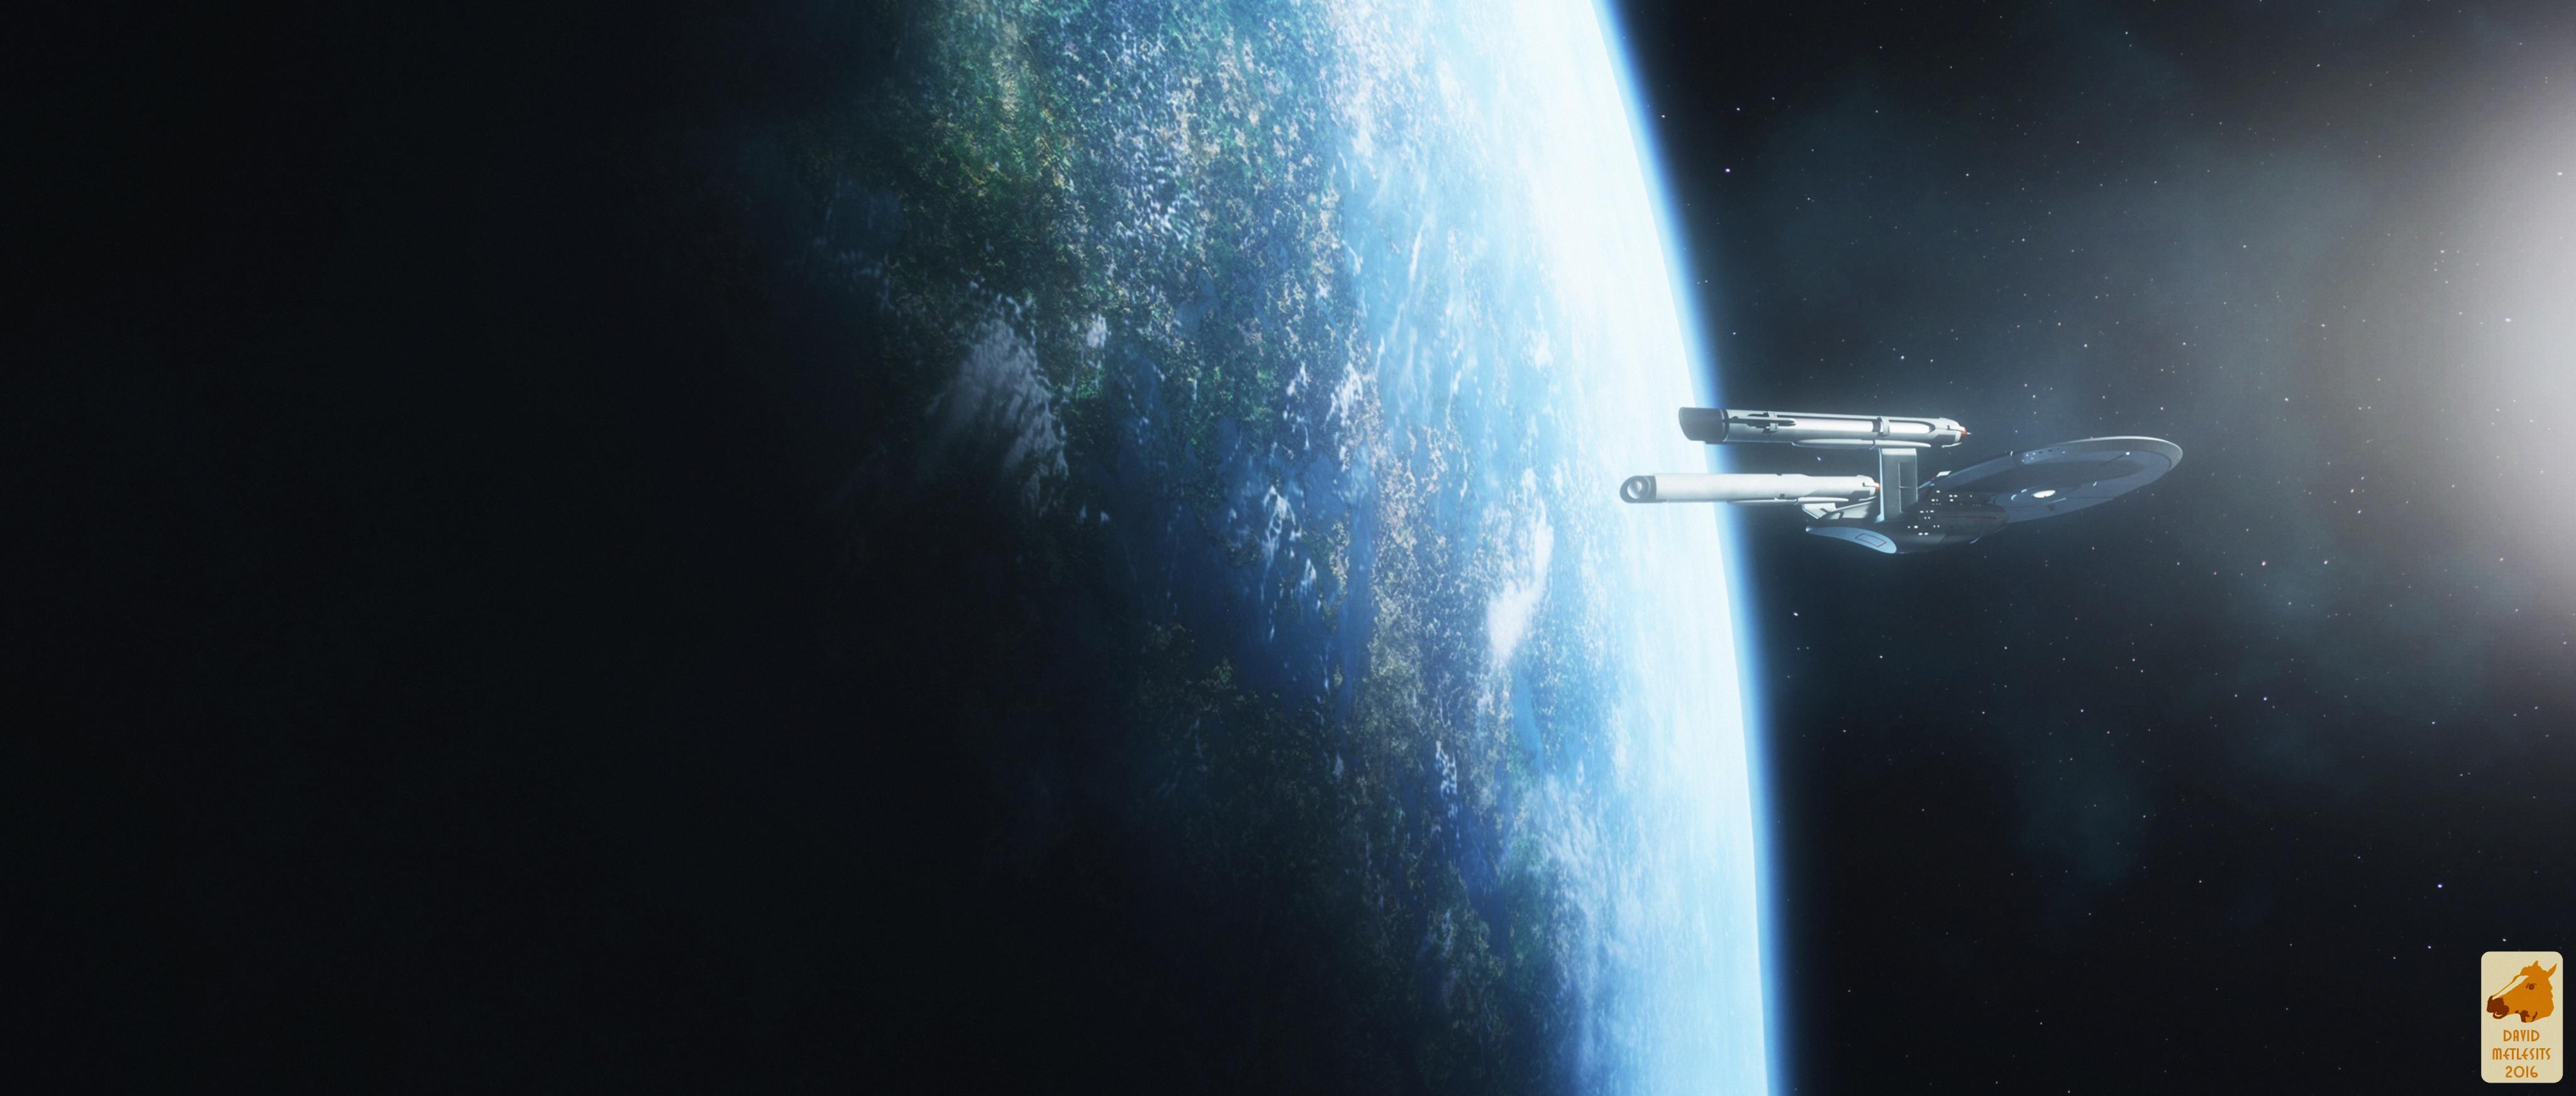 Orbit for Glenn by thefirstfleet